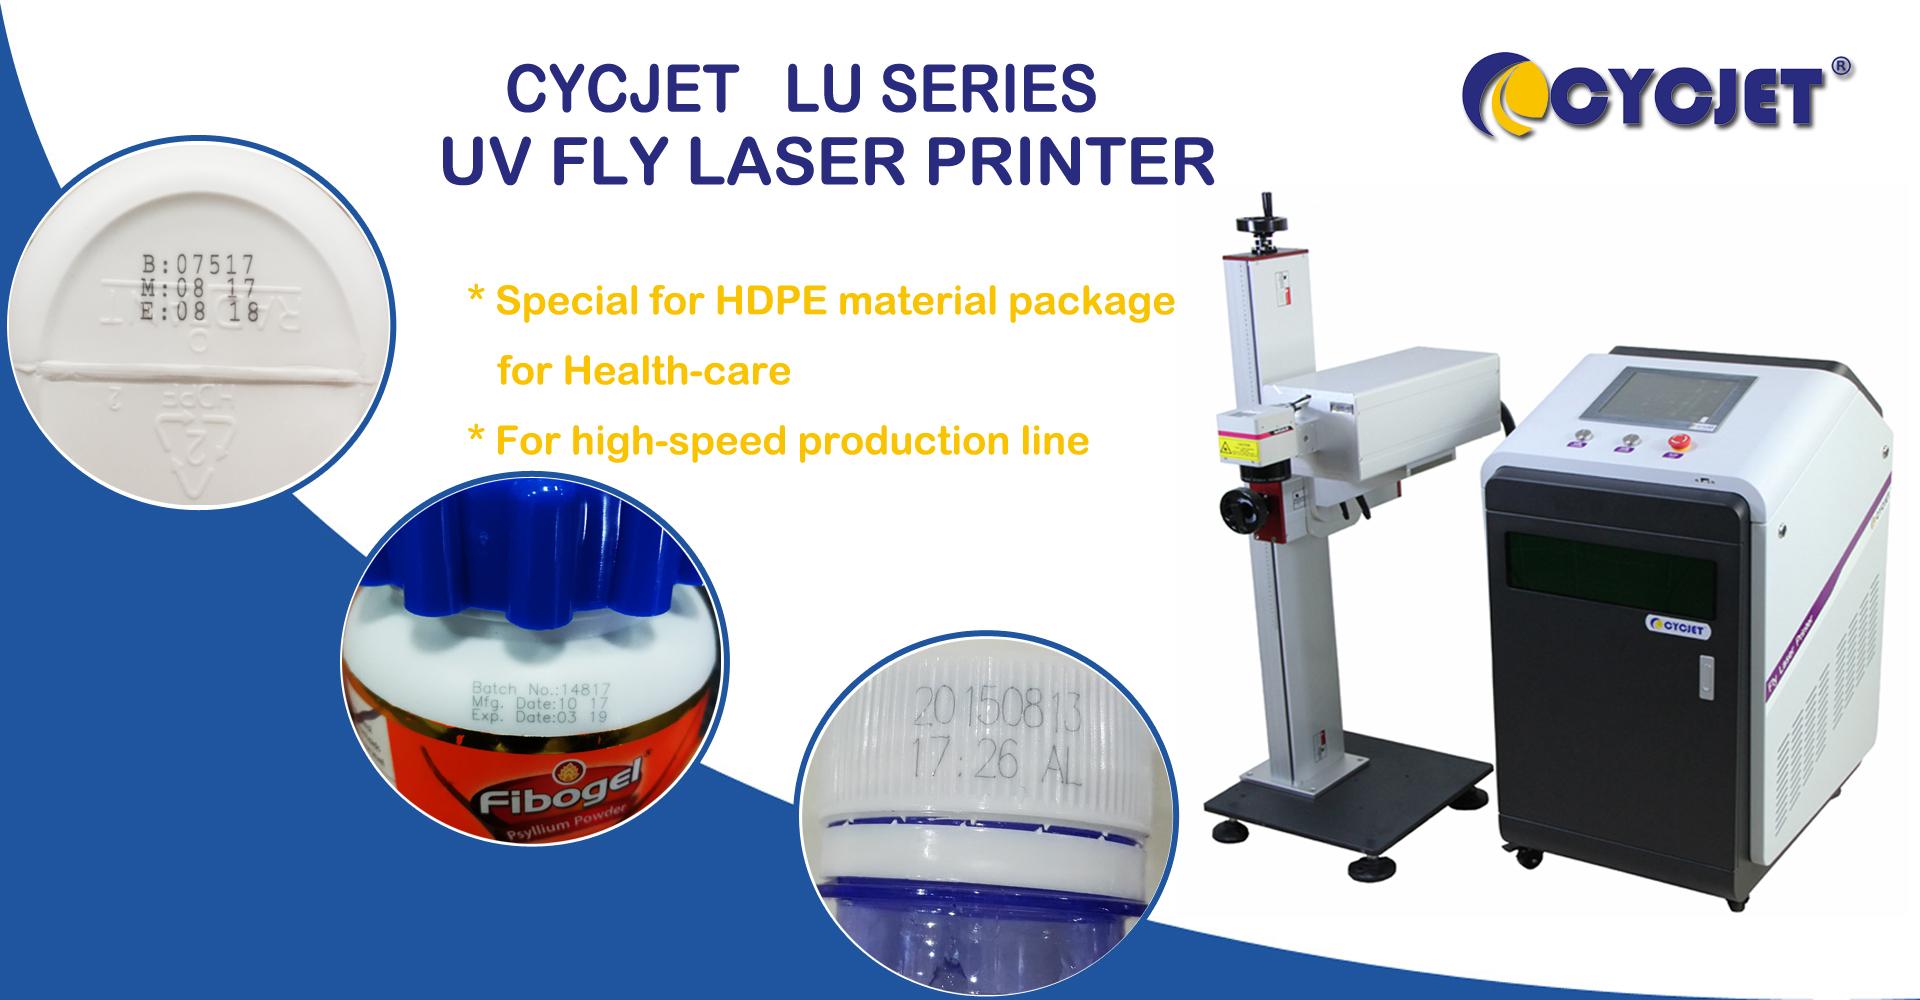 fly laser printer.jpg